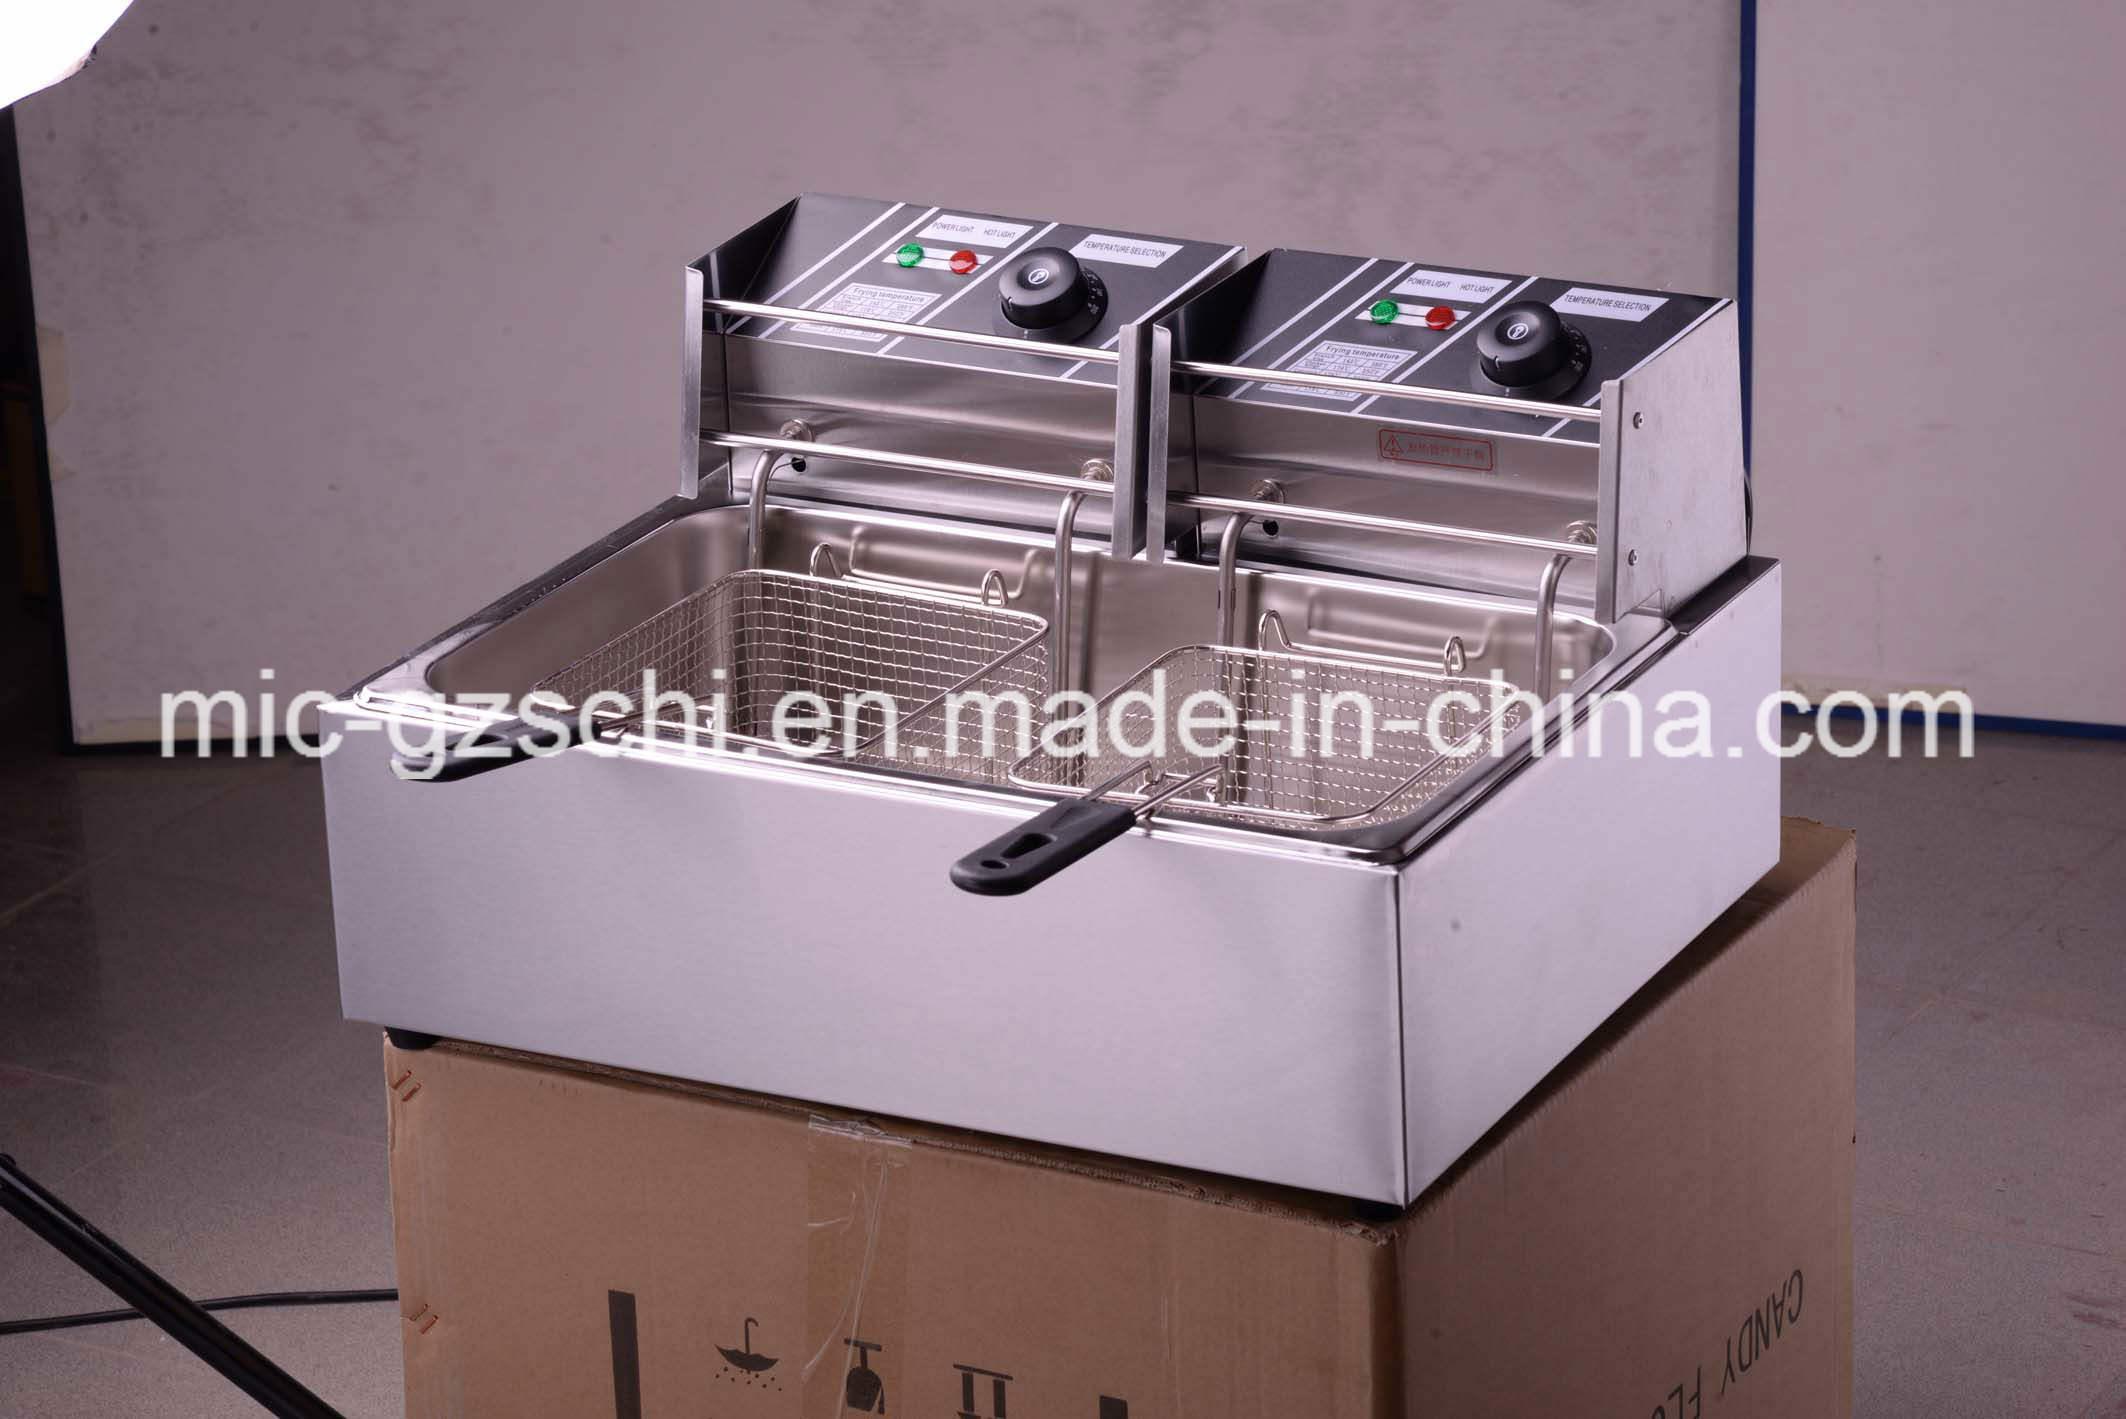 Stainless Steel Deep Fryer Chicken Deep Fryer Machine for Wholsale